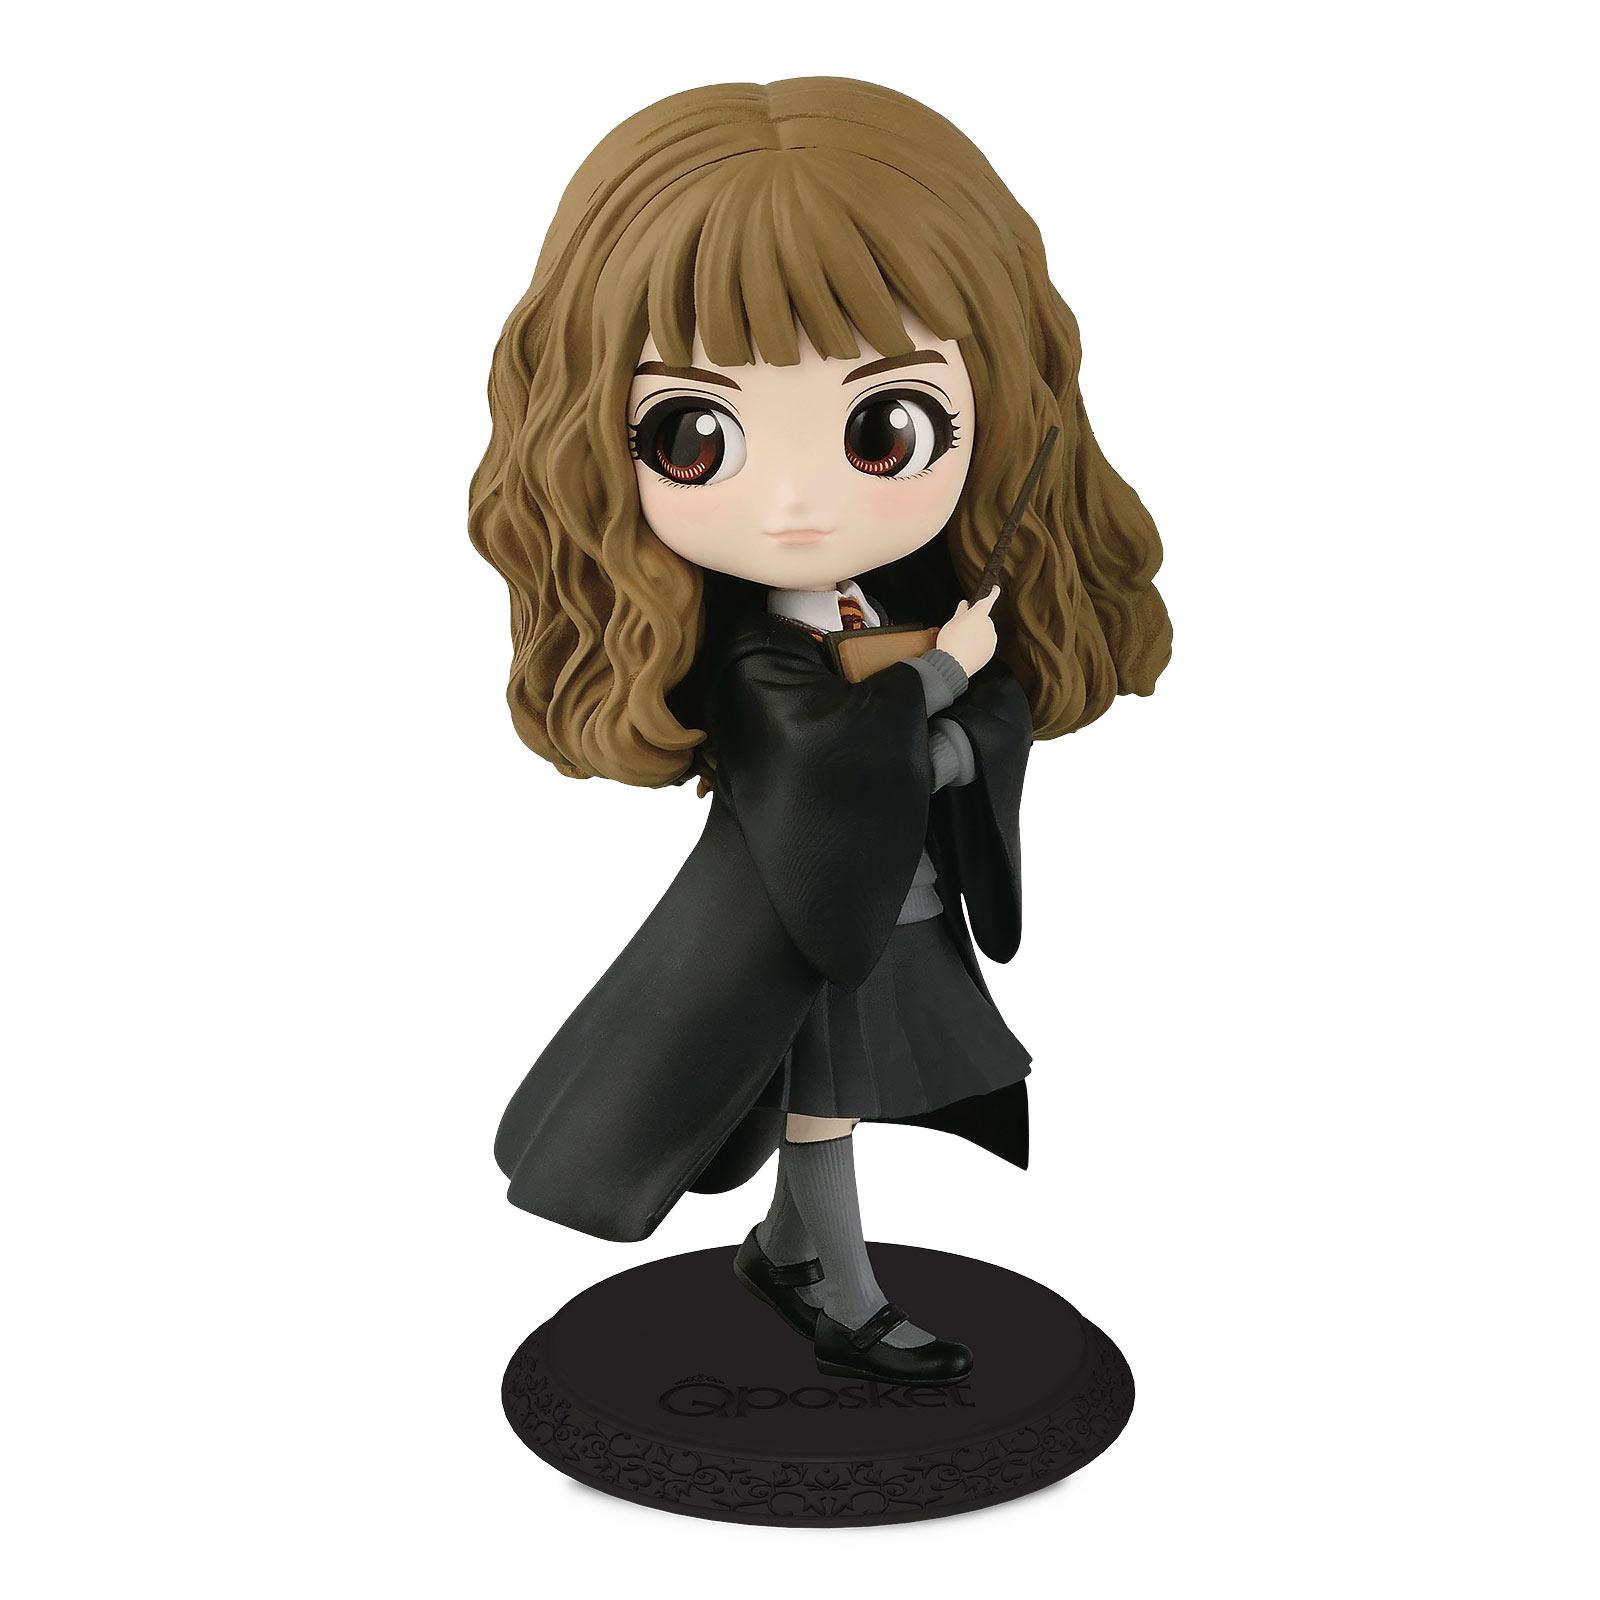 Harry Potter - Hermine Granger Q Posket Figur 14 cm